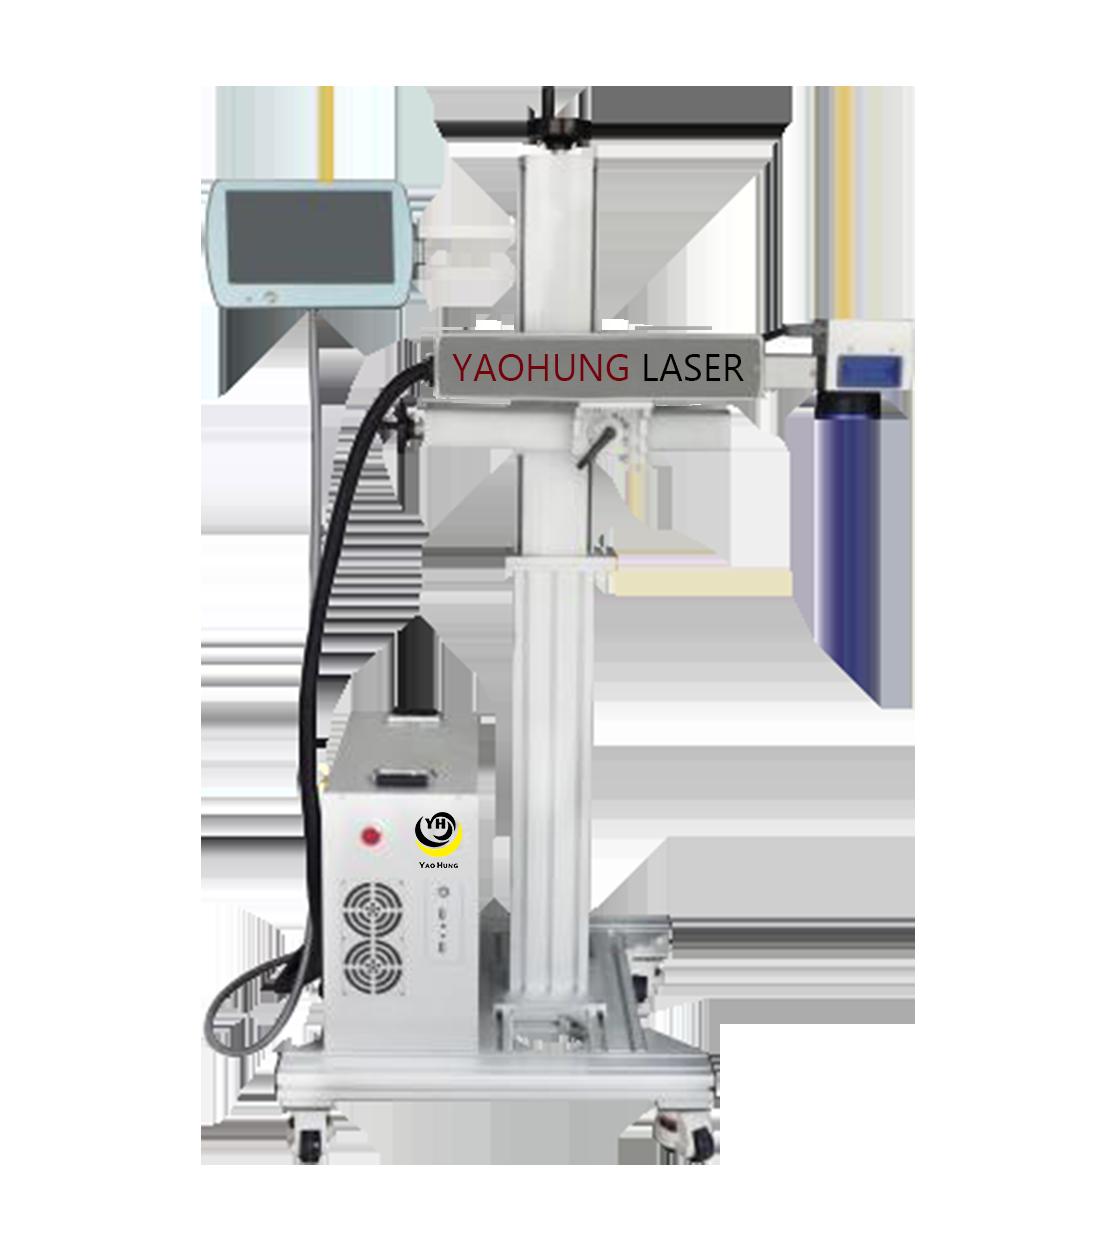 11001234Automaticmarkingmachine